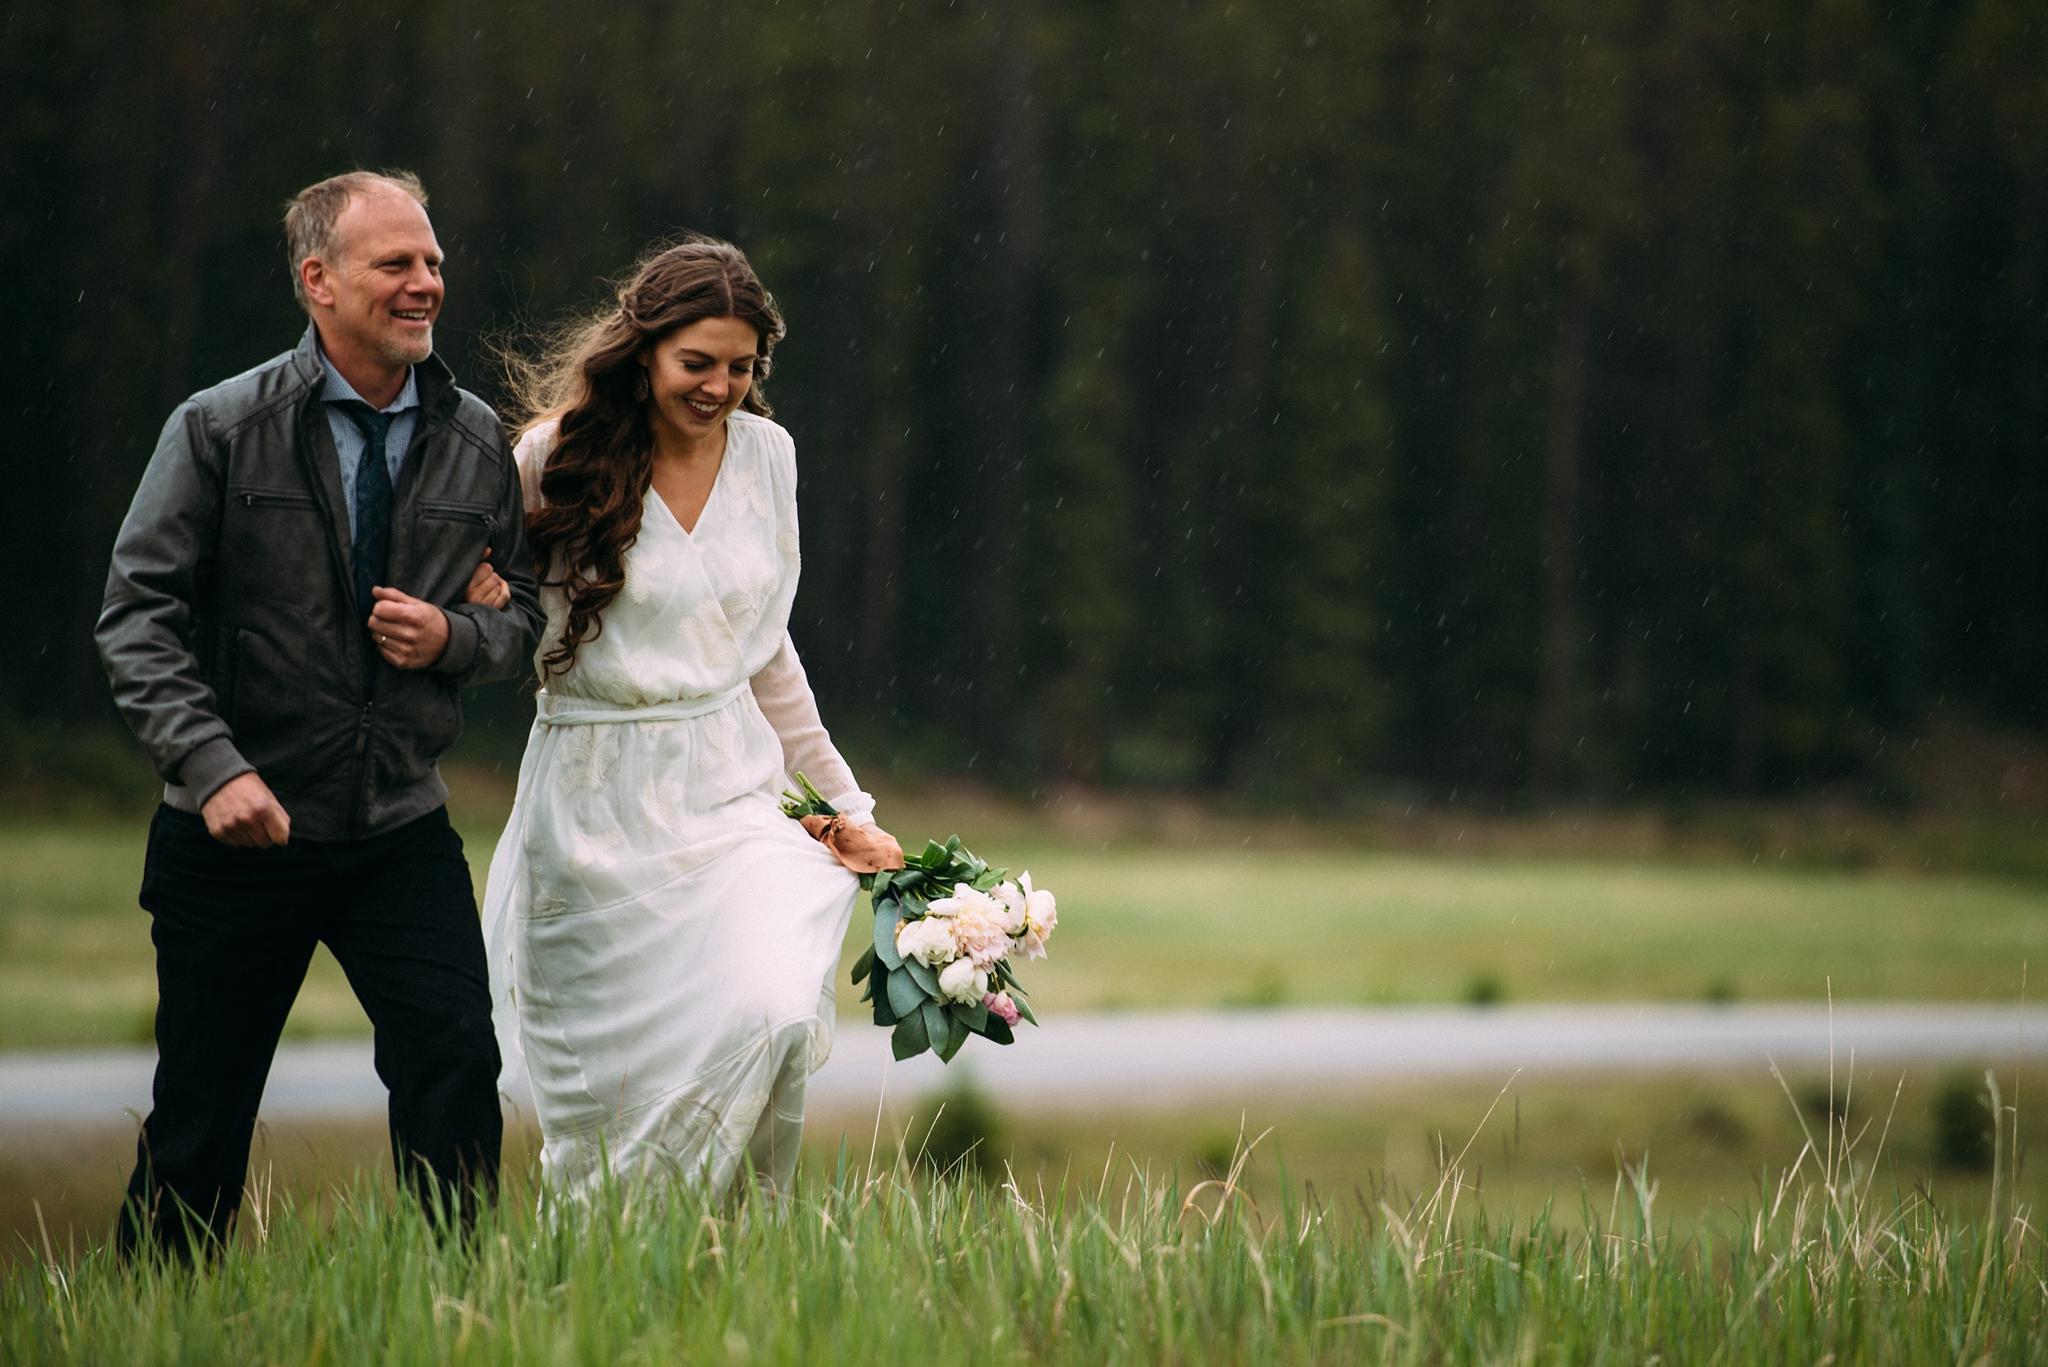 kaihla_tonai_intimate_wedding_elopement_photographer_4062